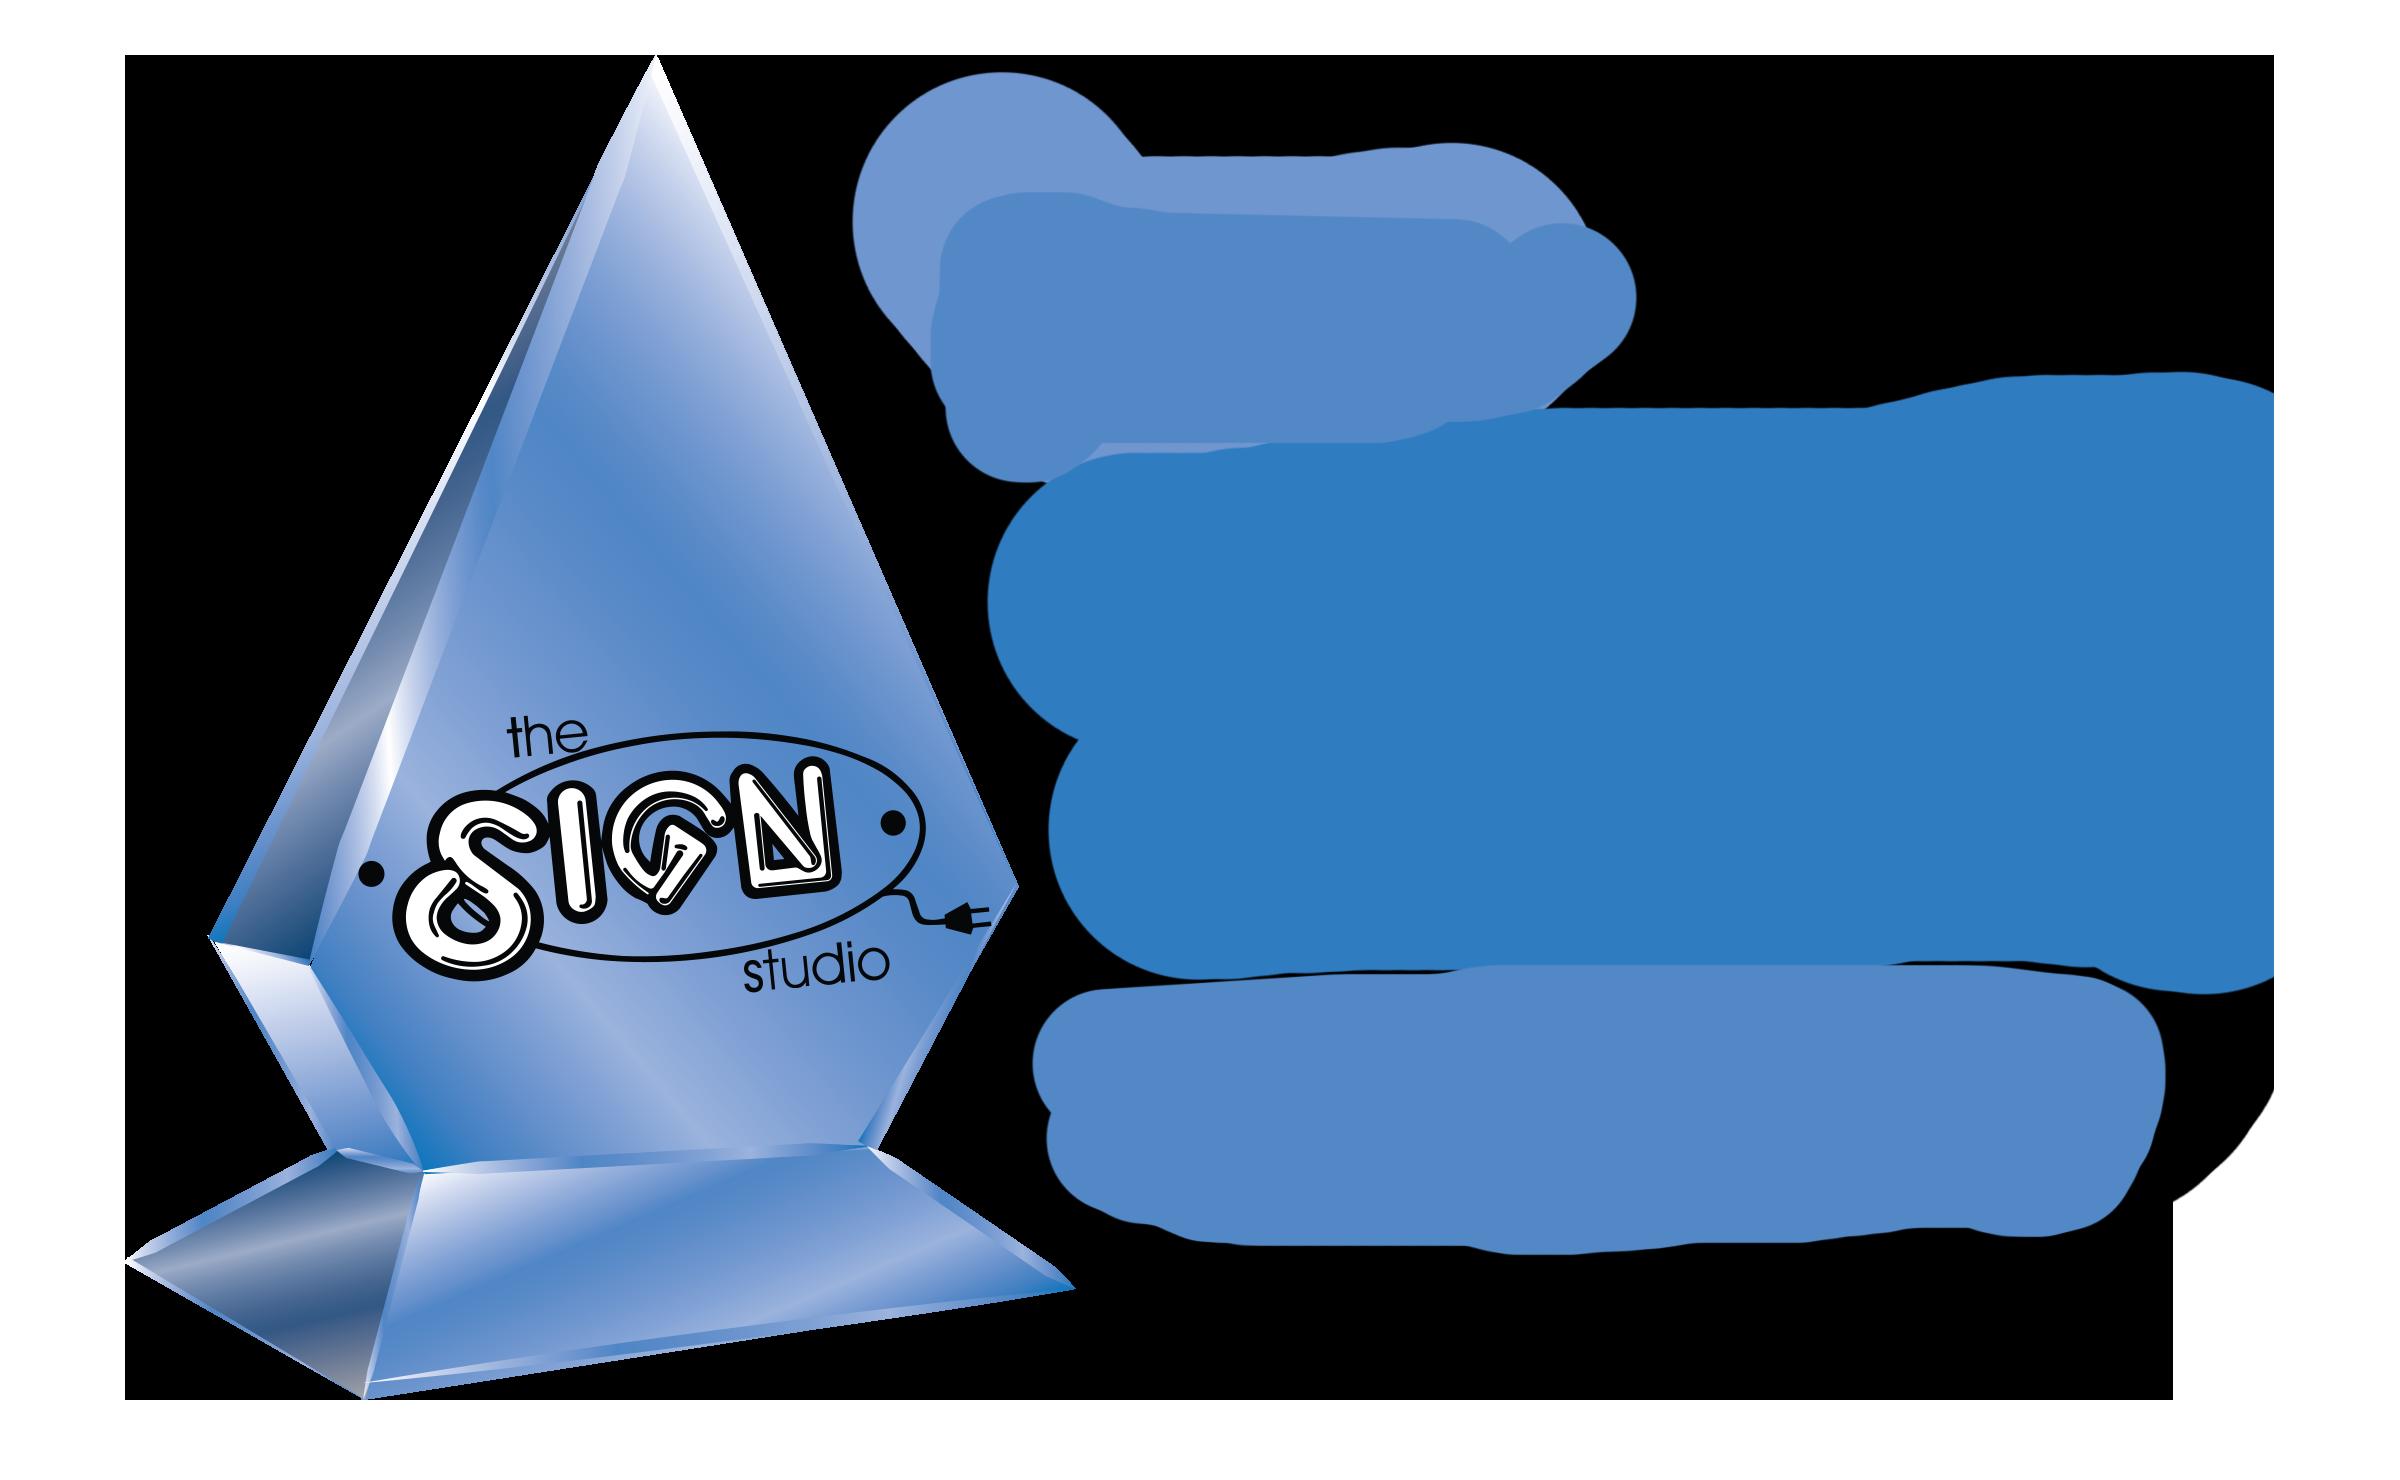 TS_logo.png